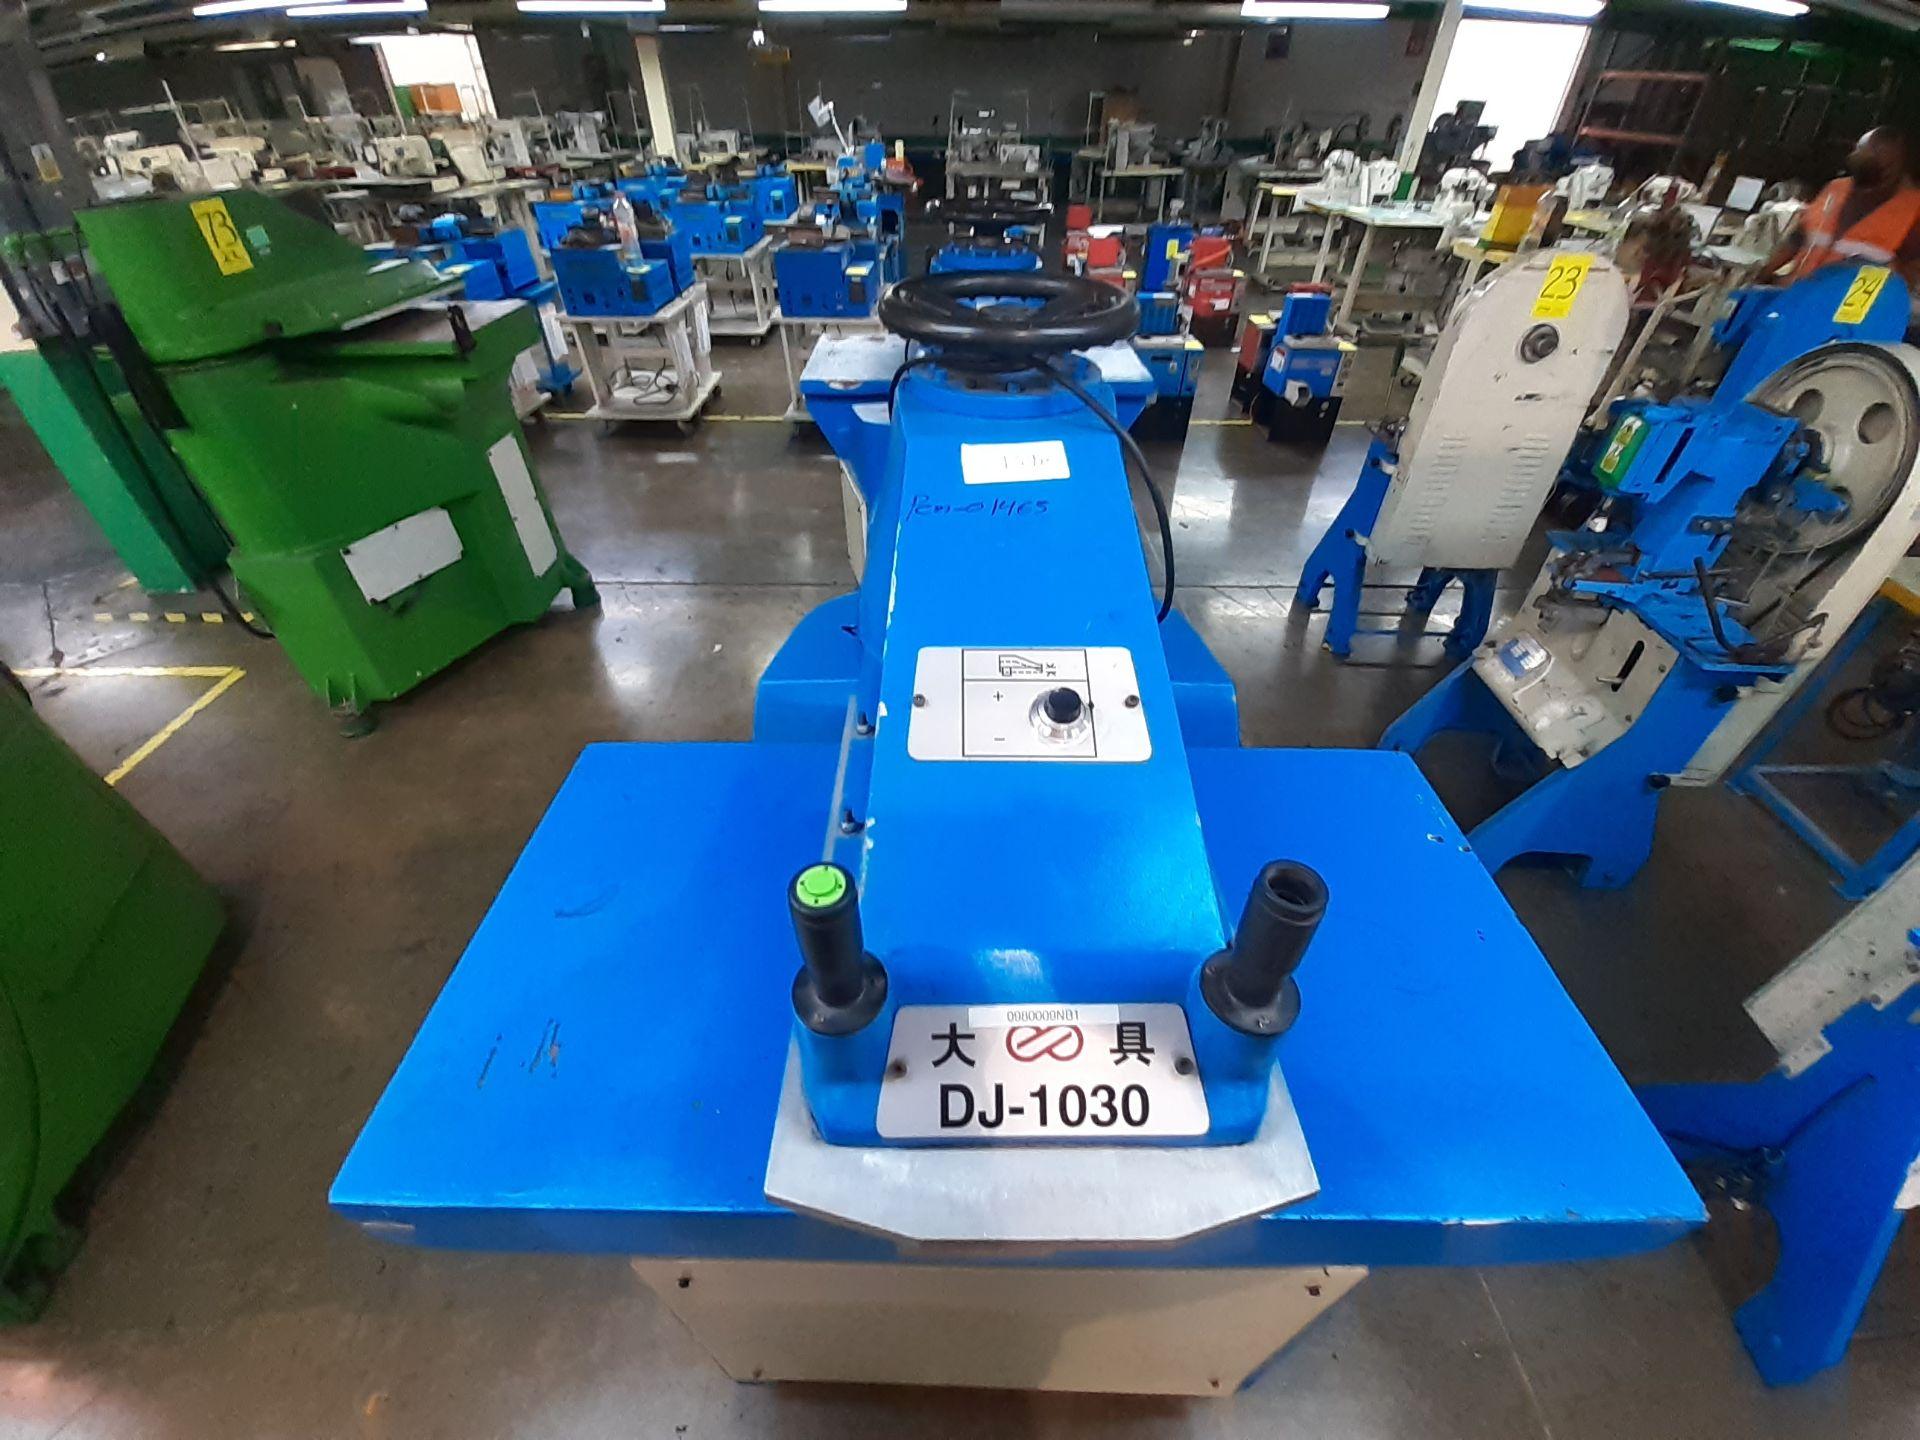 (2) Prensas de corte hidráulica de brazo oscilante, marca Dong guan Dah Dine Machine, Modelo: DJ-103 - Image 7 of 17